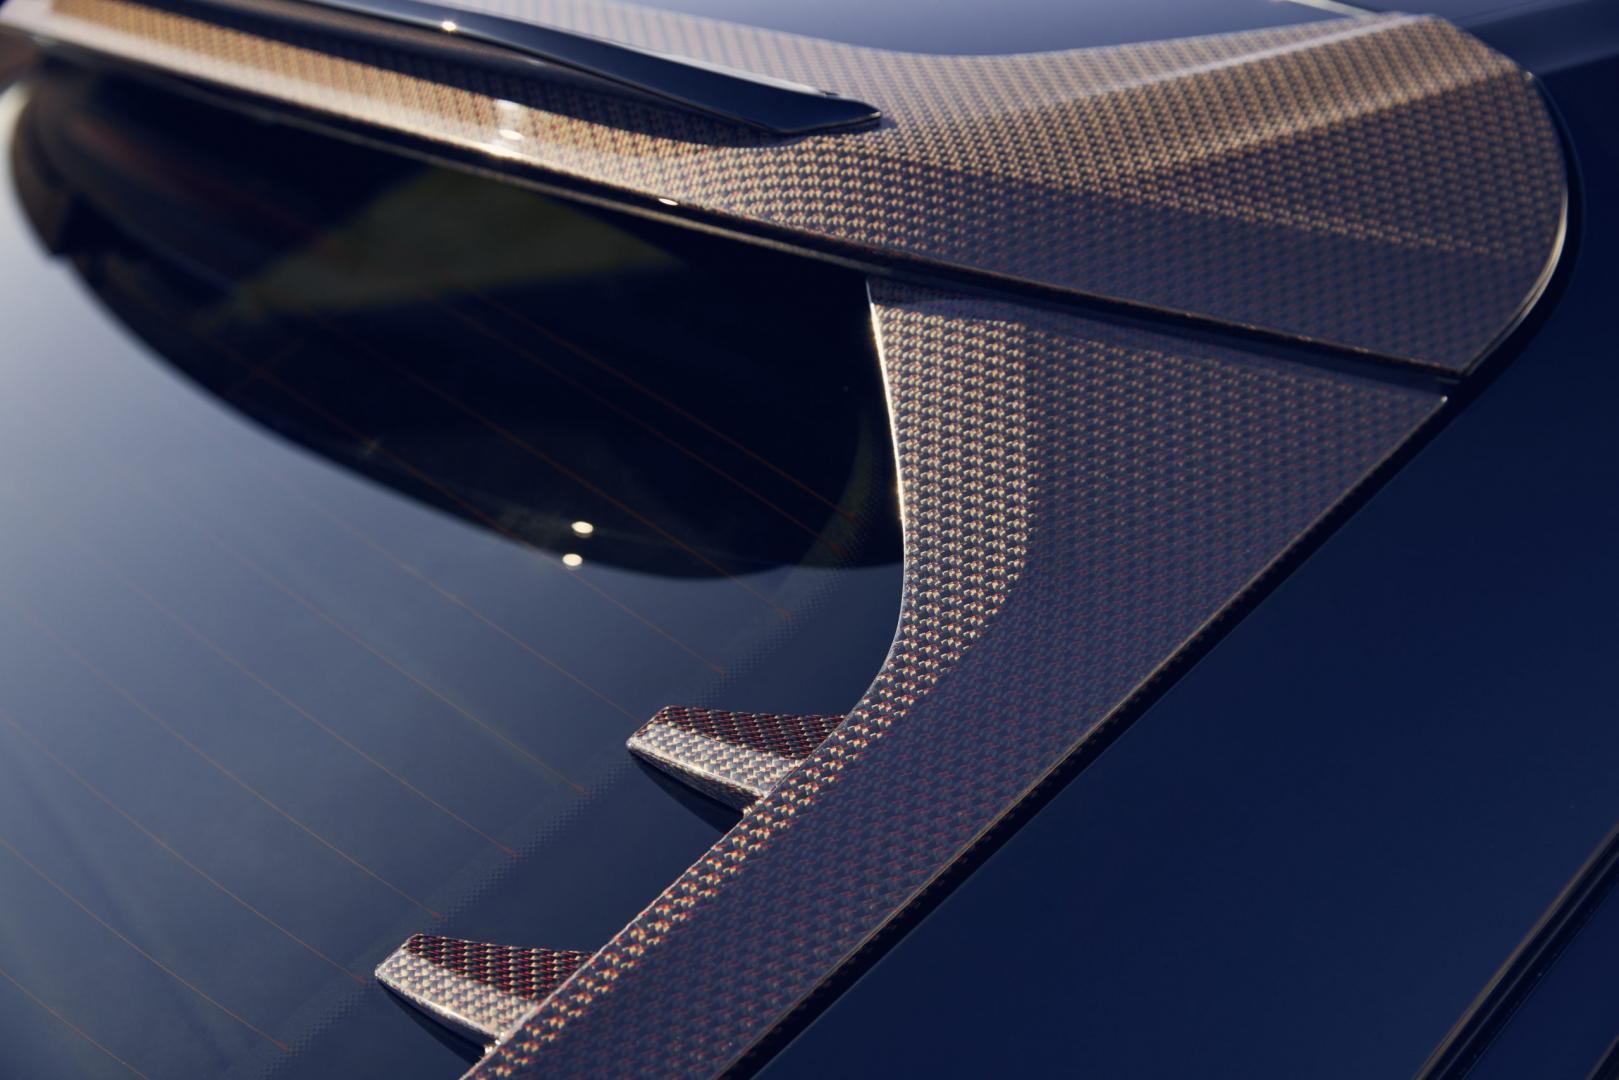 Audi RS 6 Johann Abt Signature Edition achterspoiler